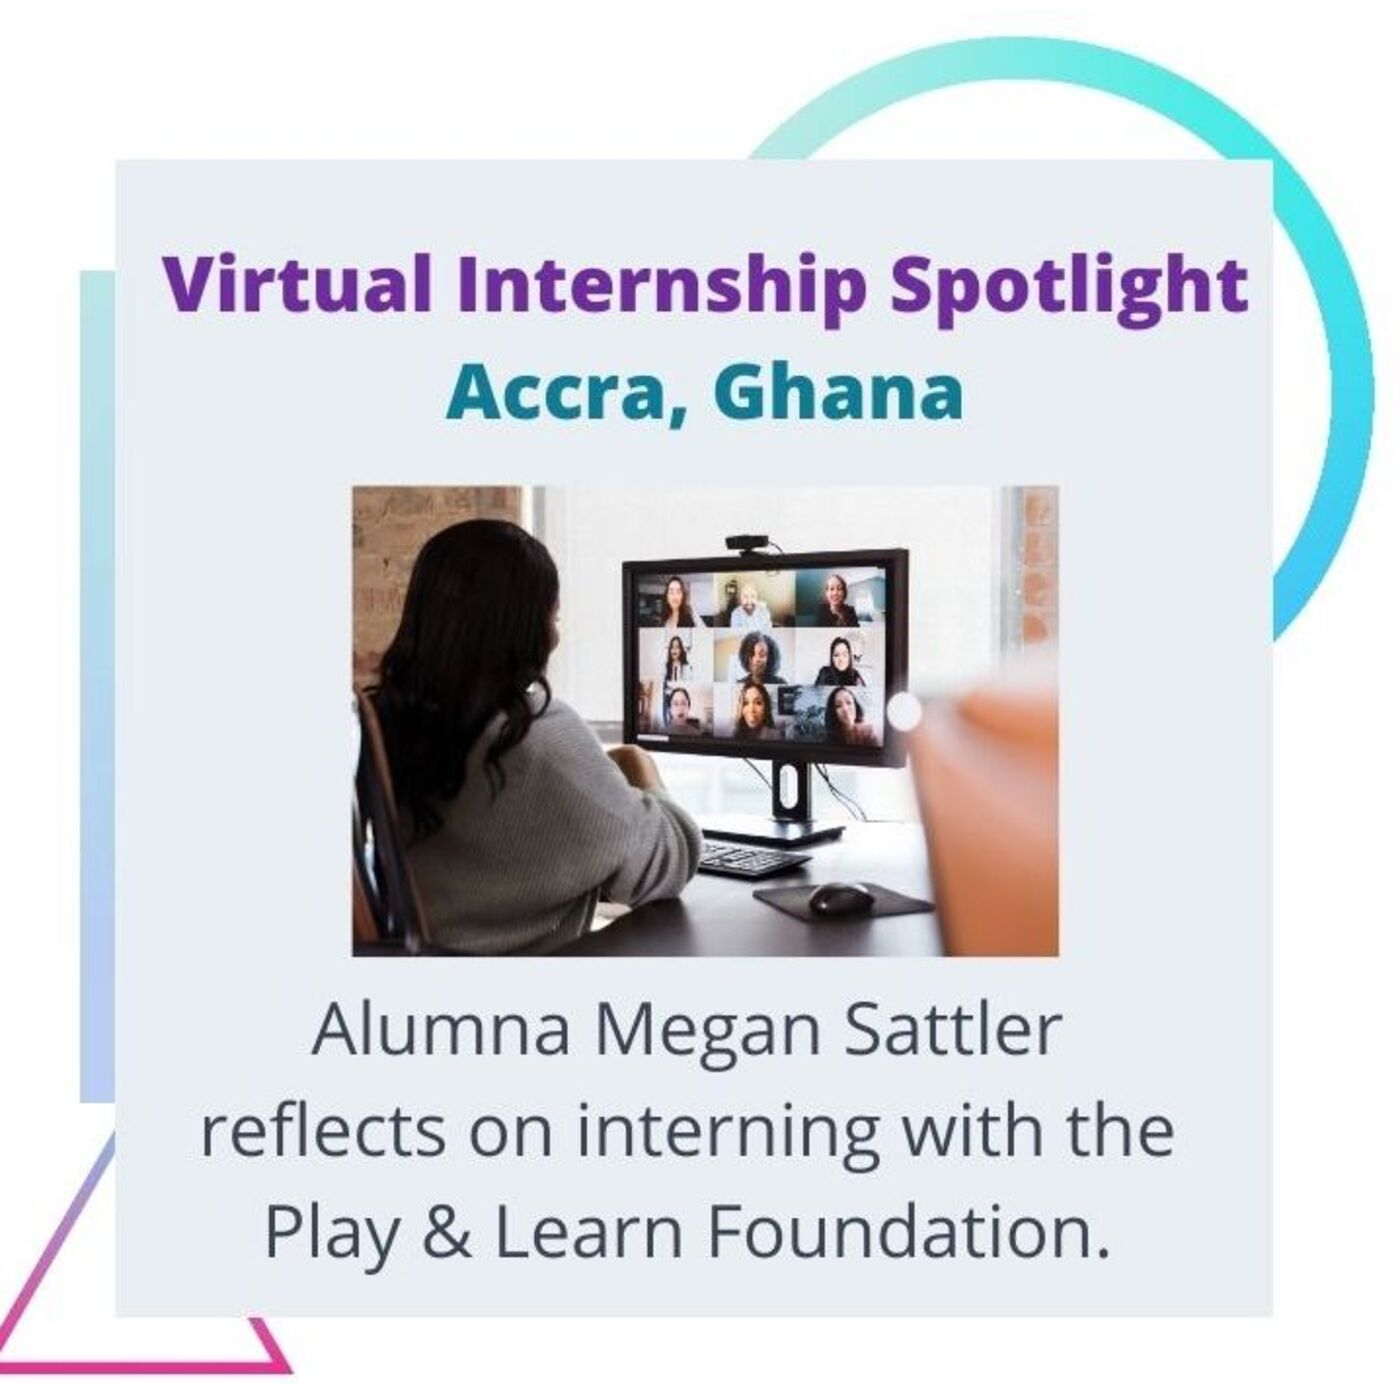 Season 2 - #4: Virtual Internship Spotlight & Intern Reflection